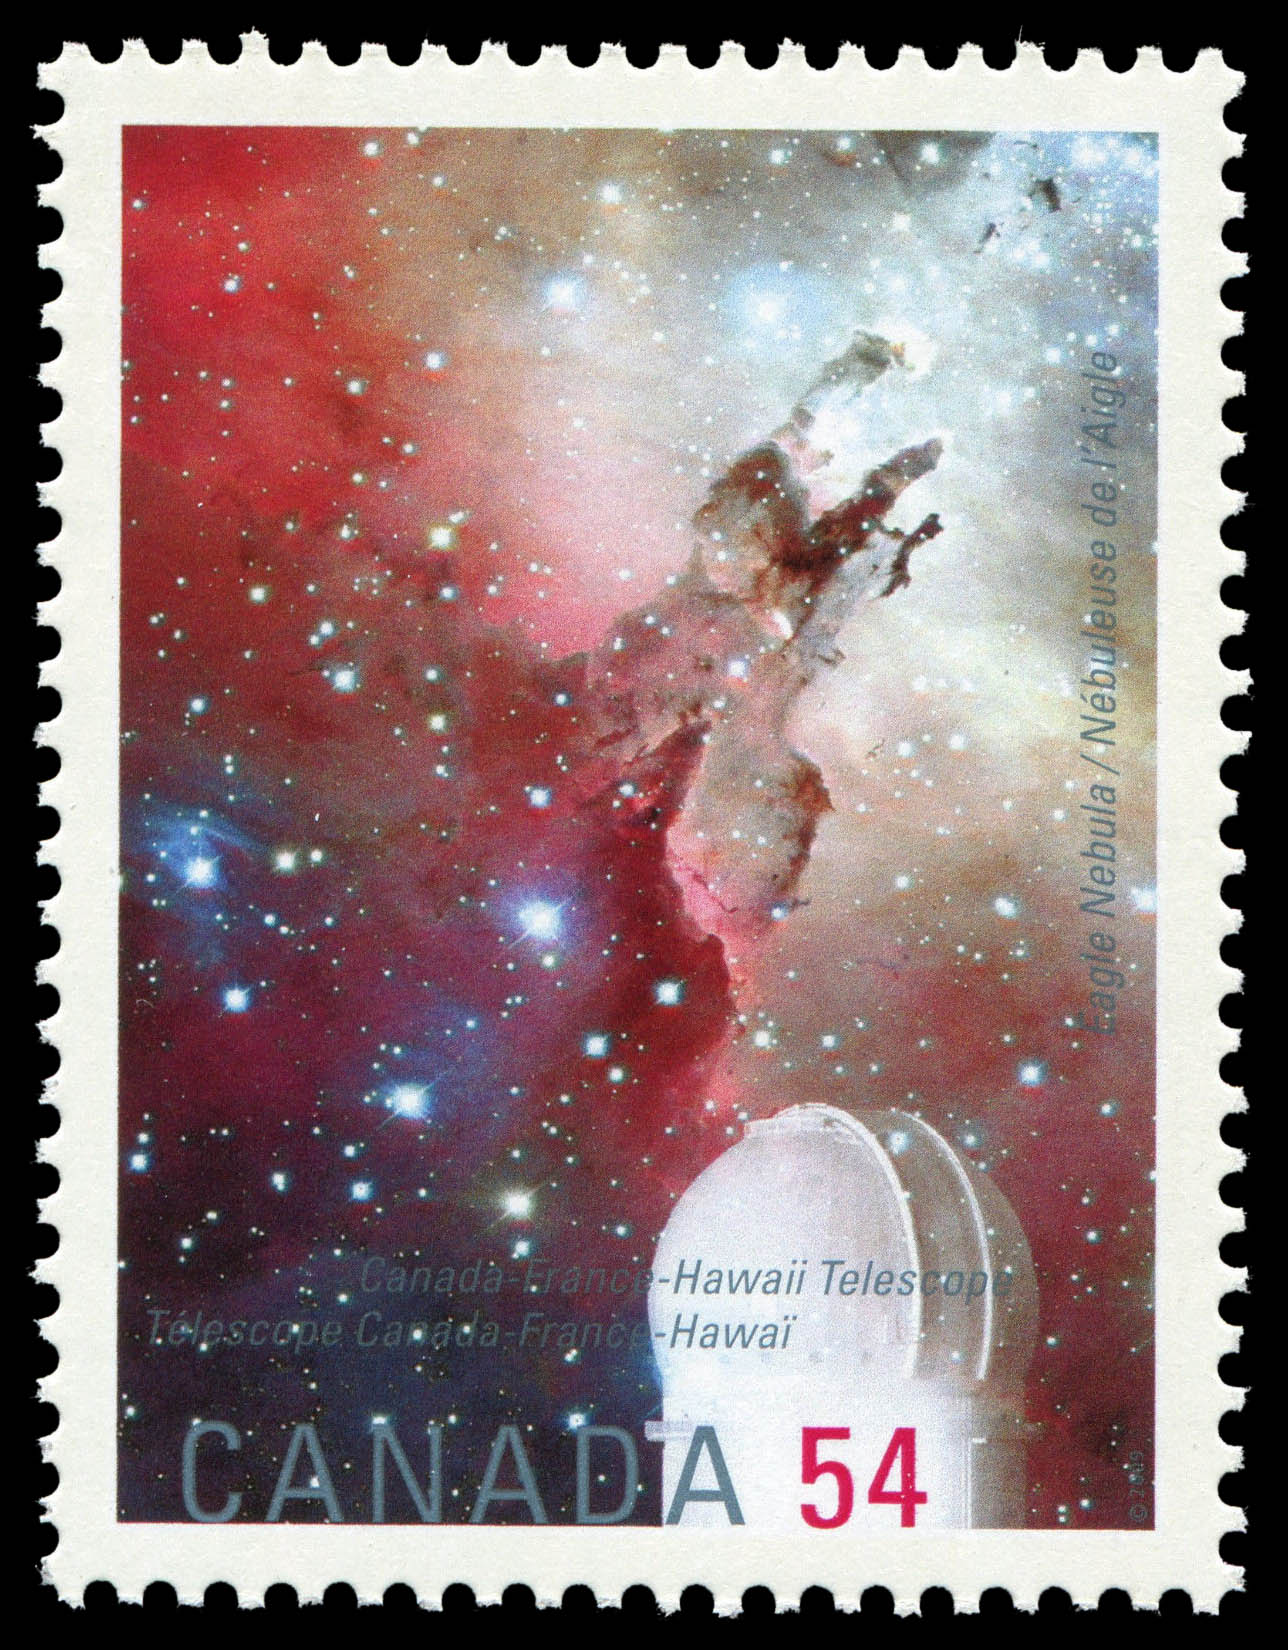 Eagle Nebula, Canada-France-Hawaii Telescope Canada Postage Stamp | International Year of Astronomy